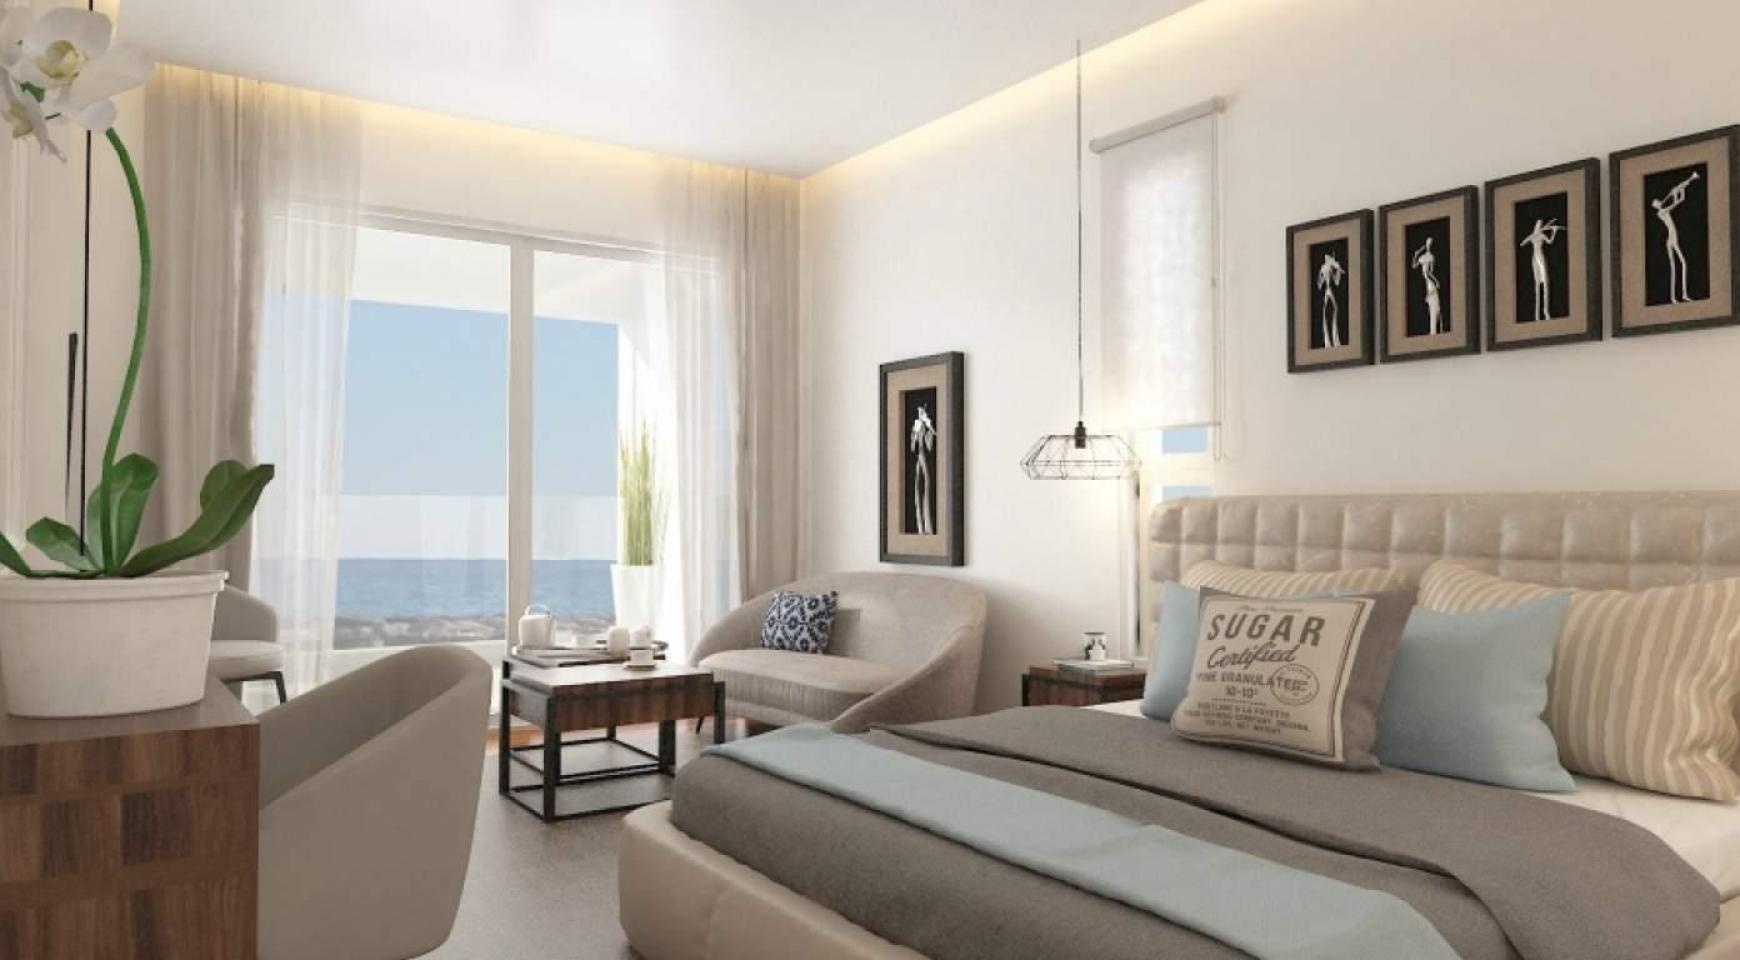 Contemporary Beachfront Villa with 5 Bedrooms - 15